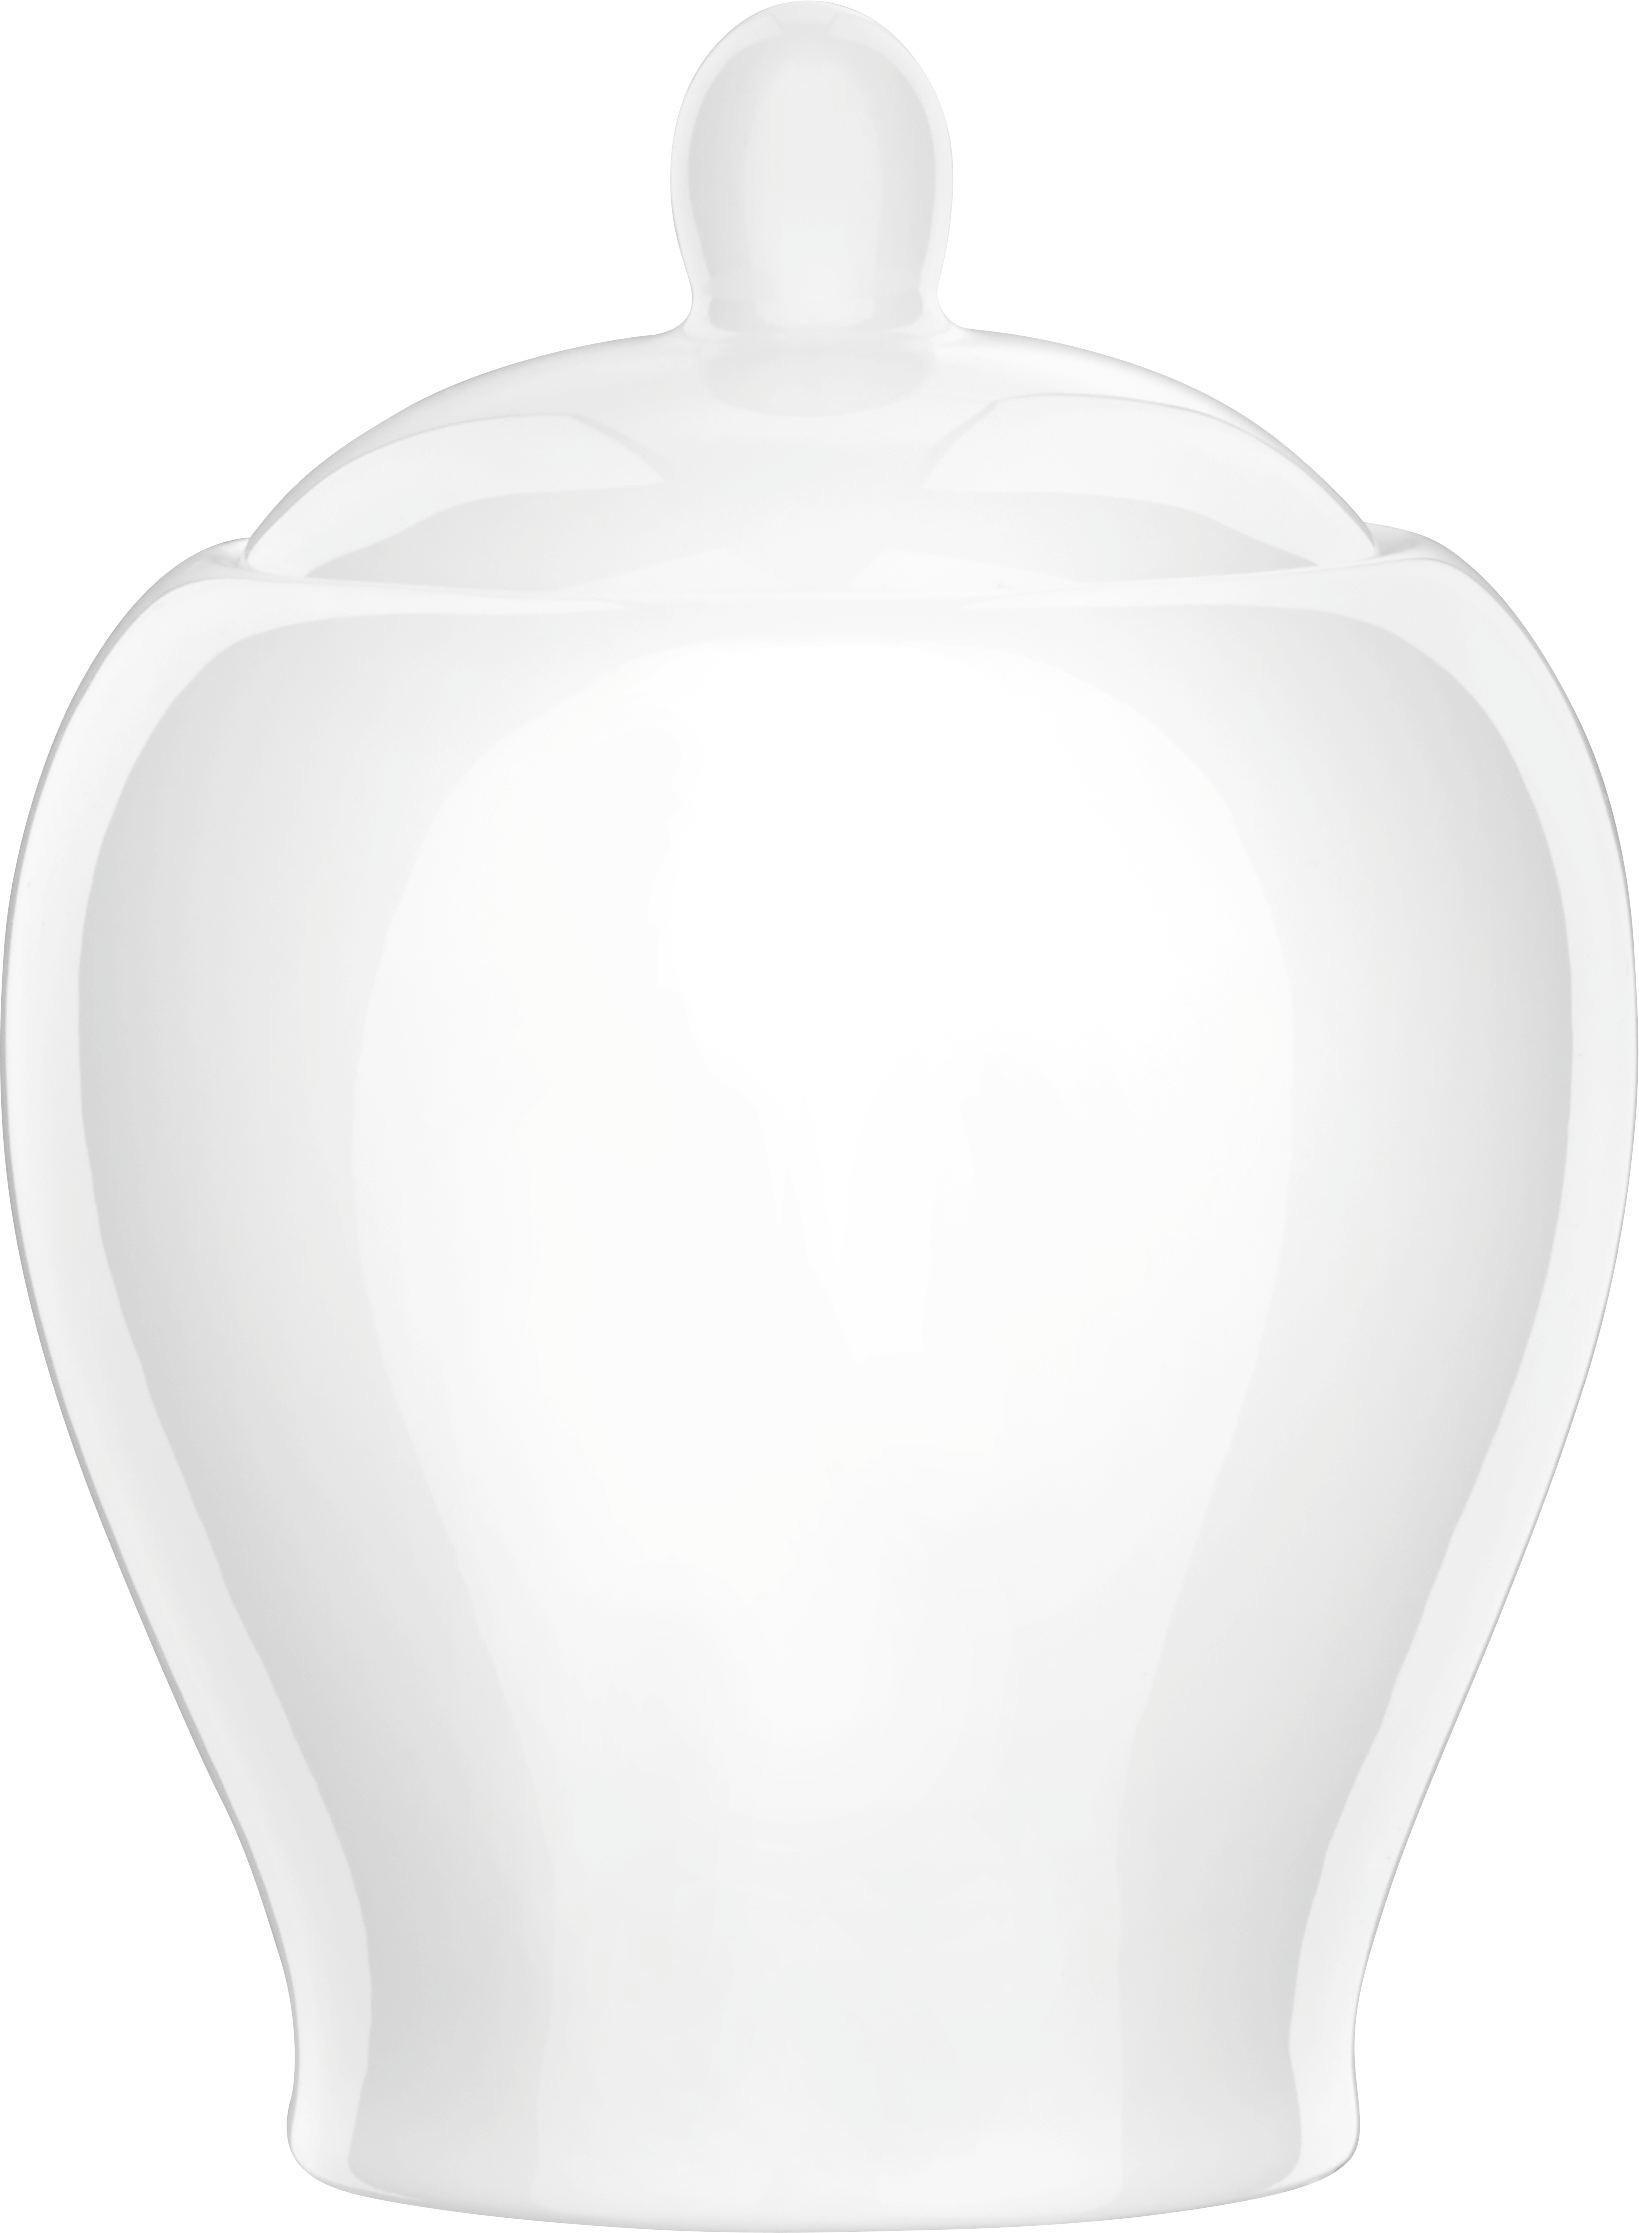 Posoda Za Sladkor Bonnie - bela, Moderno, keramika (0,35l) - MÖMAX modern living